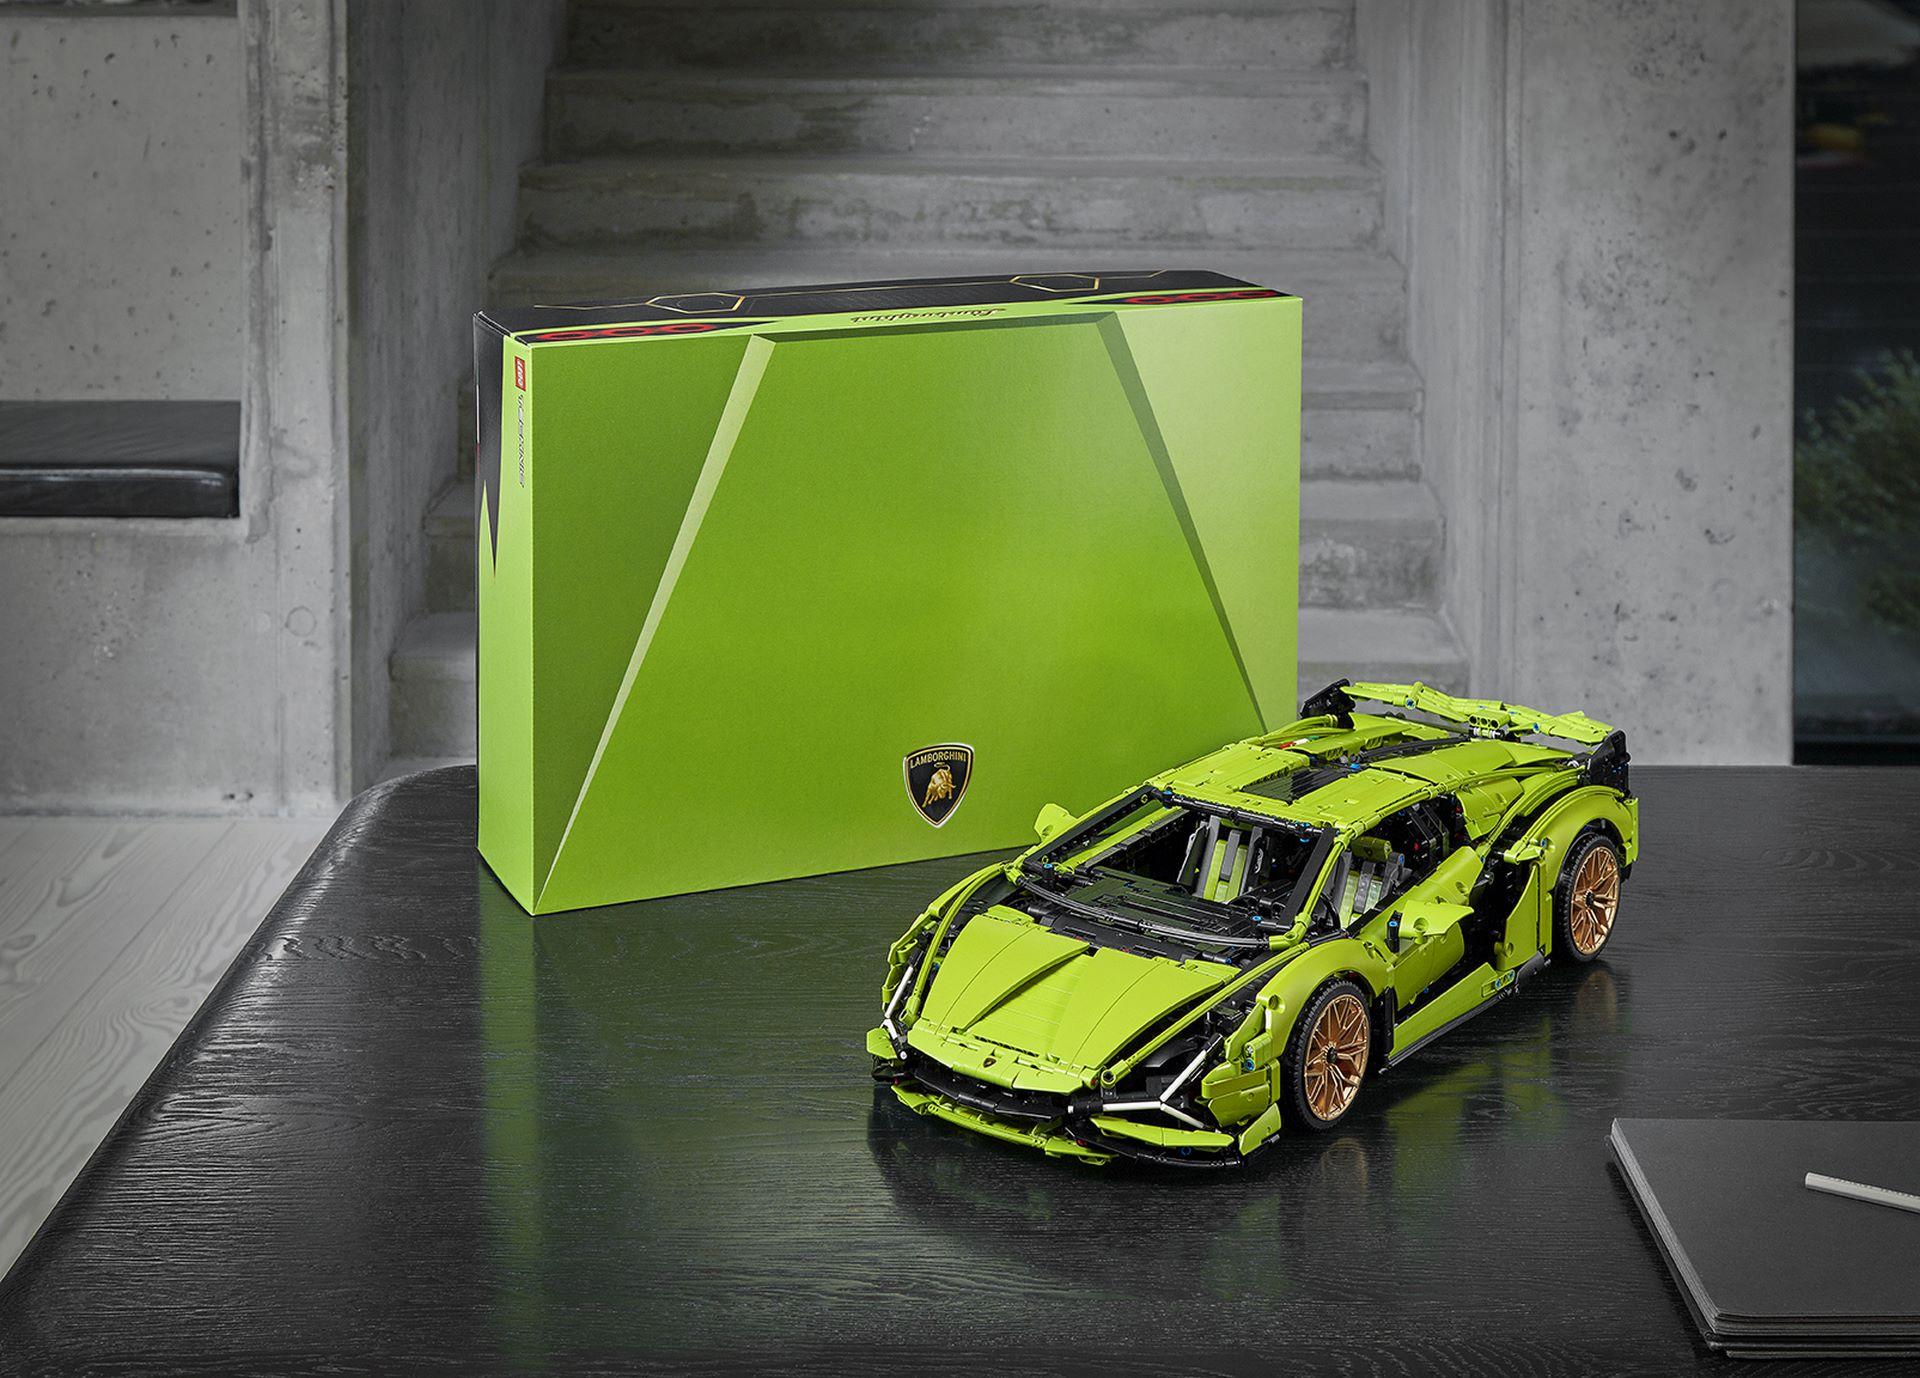 Lamborghini-Sian-FKP-37-Lego-Technic-3